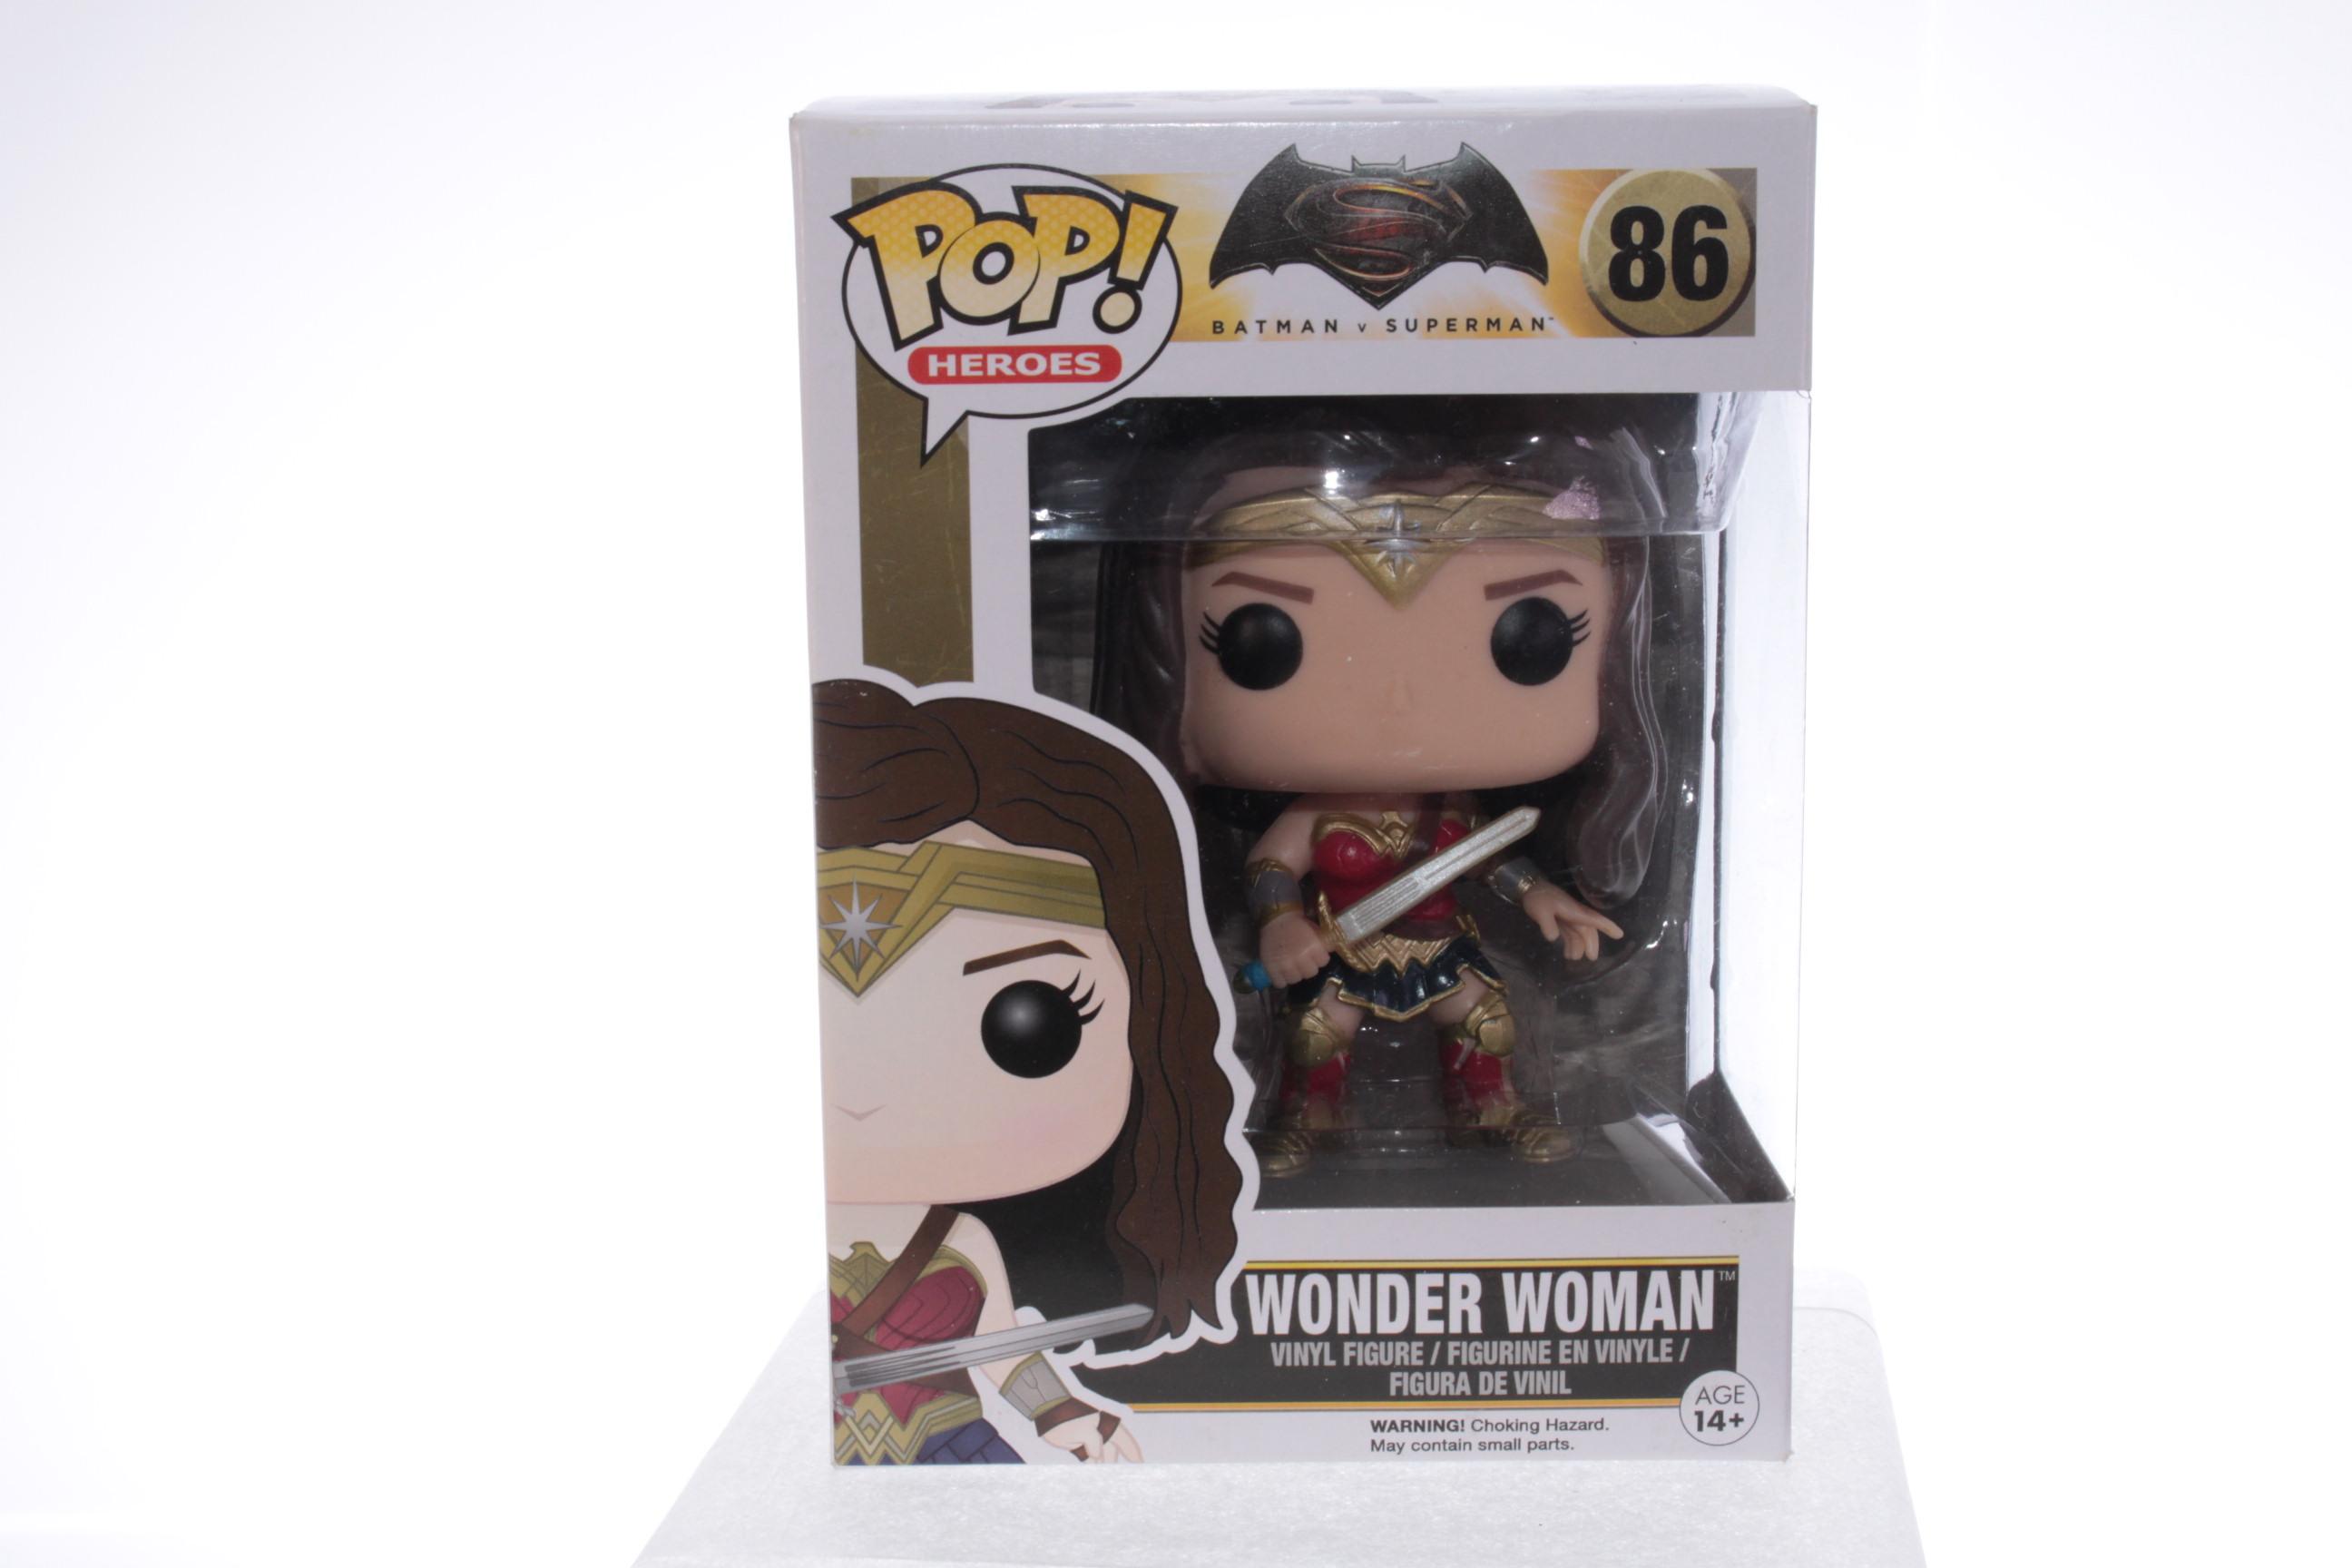 Wonder Woman Funko POP Sepia Tone Black and White Batman Vs Superman 86